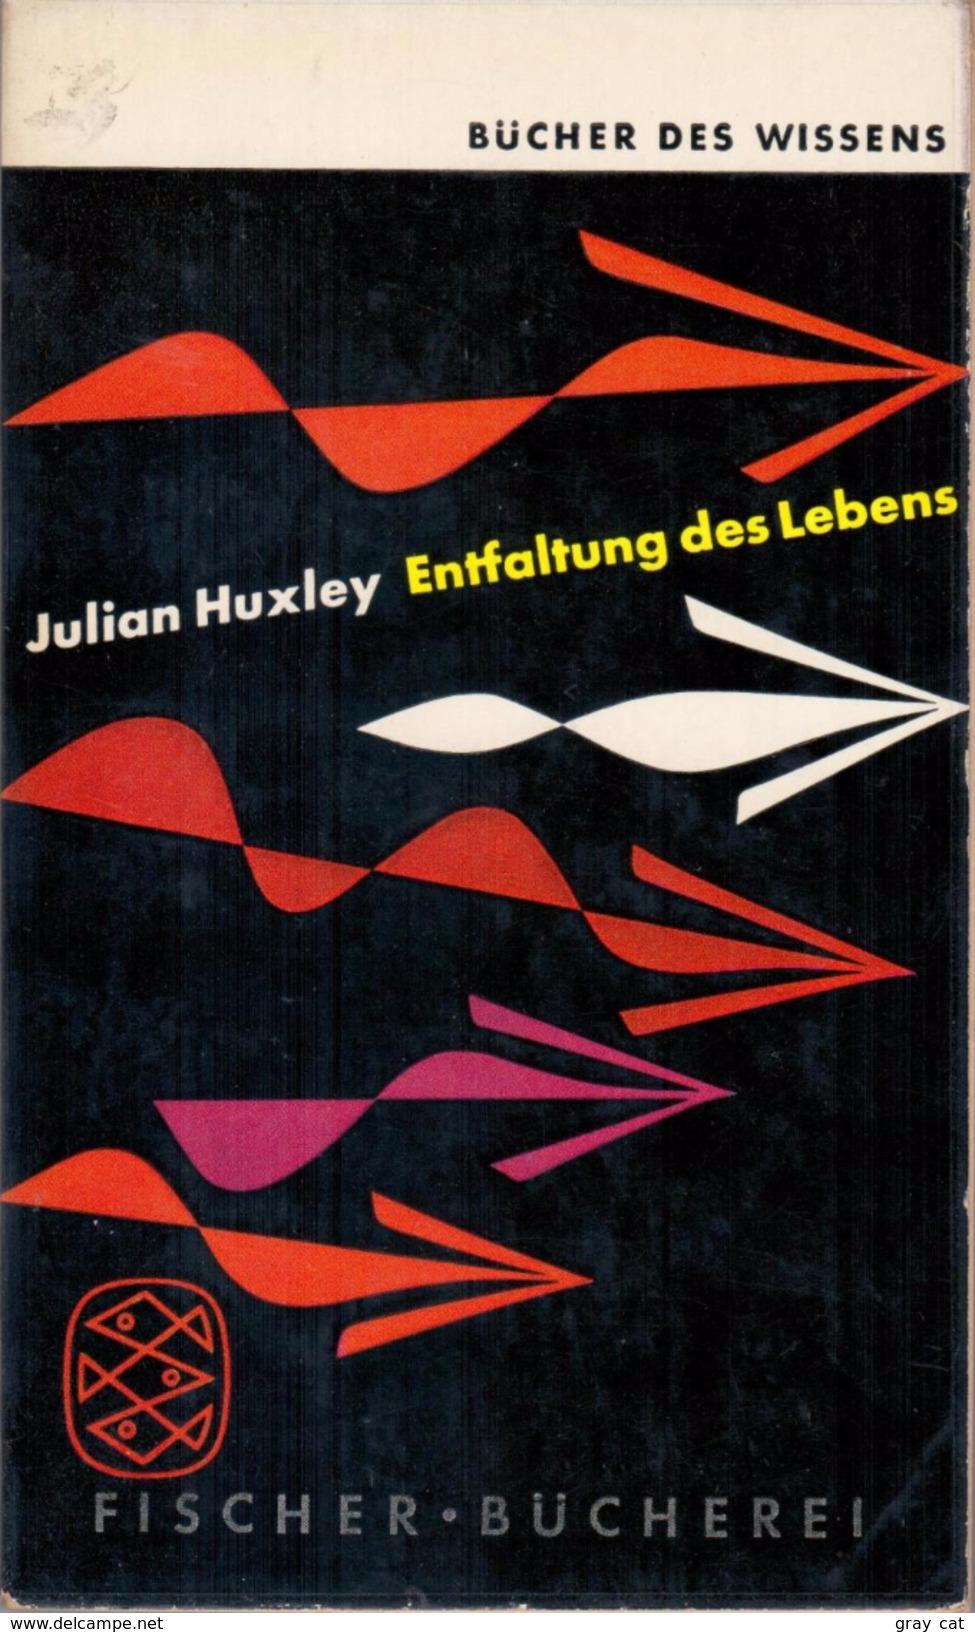 Entfaltung Des Lebens By Huxley, Julian - Books, Magazines, Comics